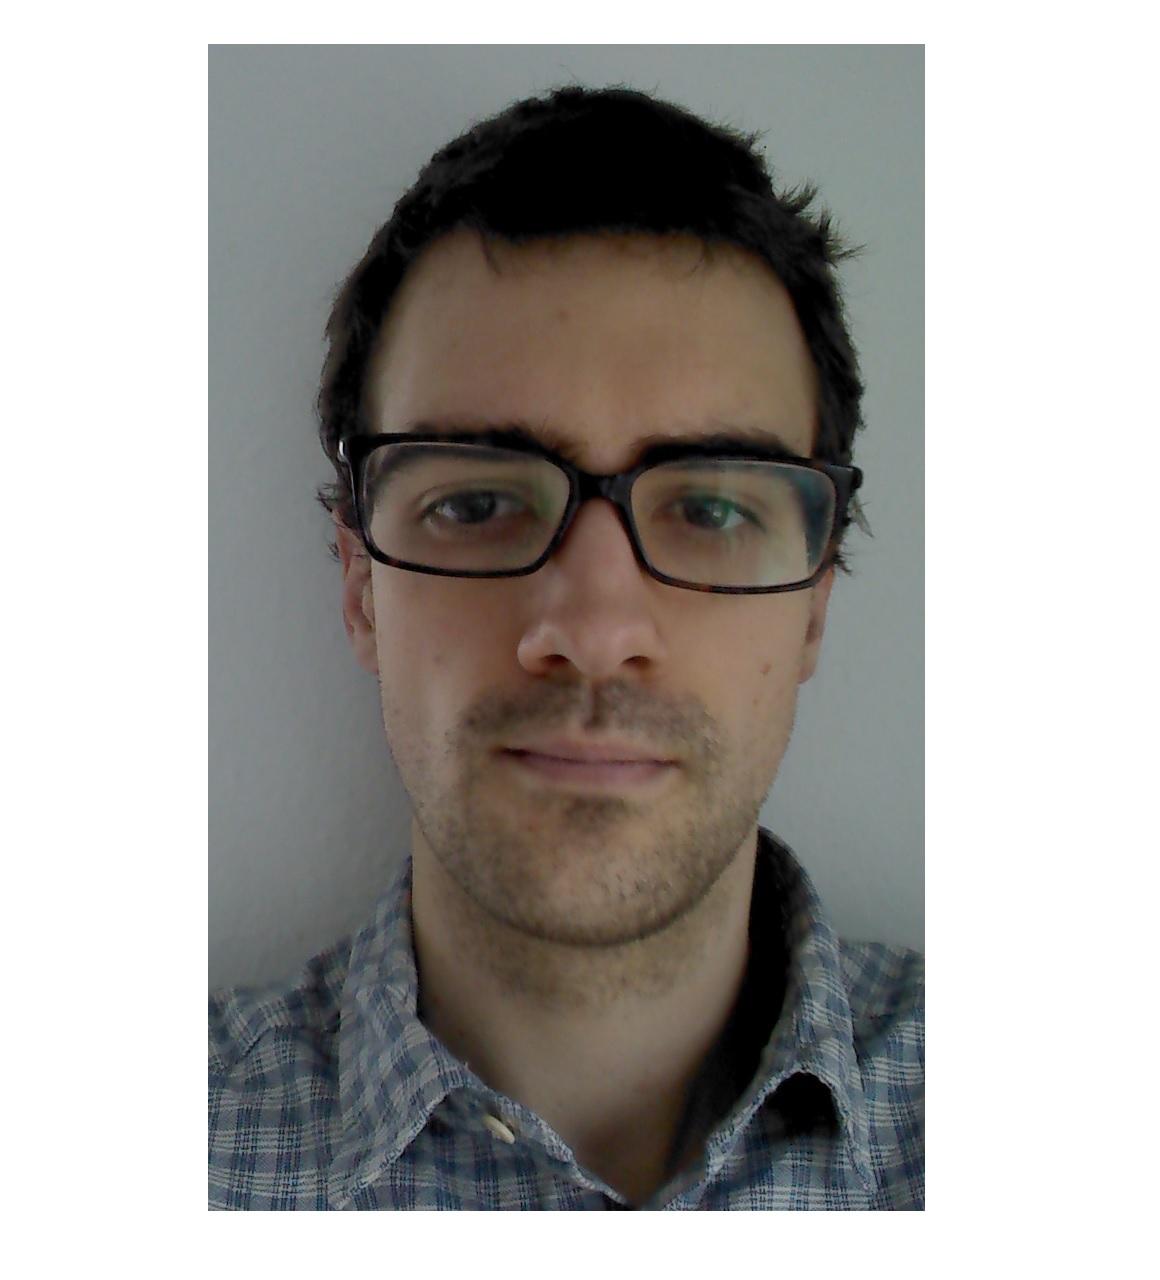 Guy Yealland - PhD (Pass, minor corrections) - Biomedical Science/Neuroscience - Subject Matter Expert from Kolabtree